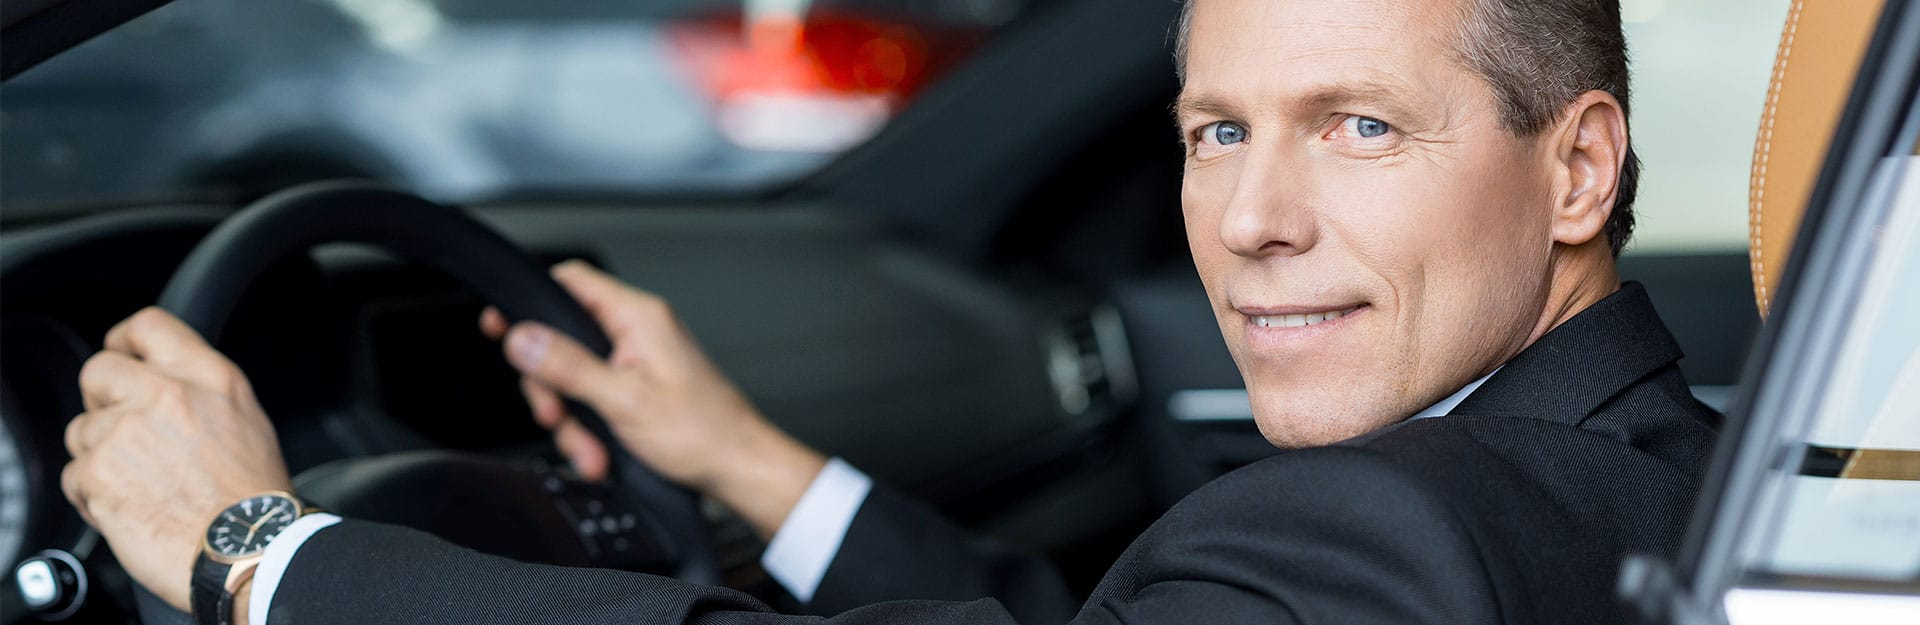 Leasingaufbereitung Gebrauchtwagen Firmenwagen